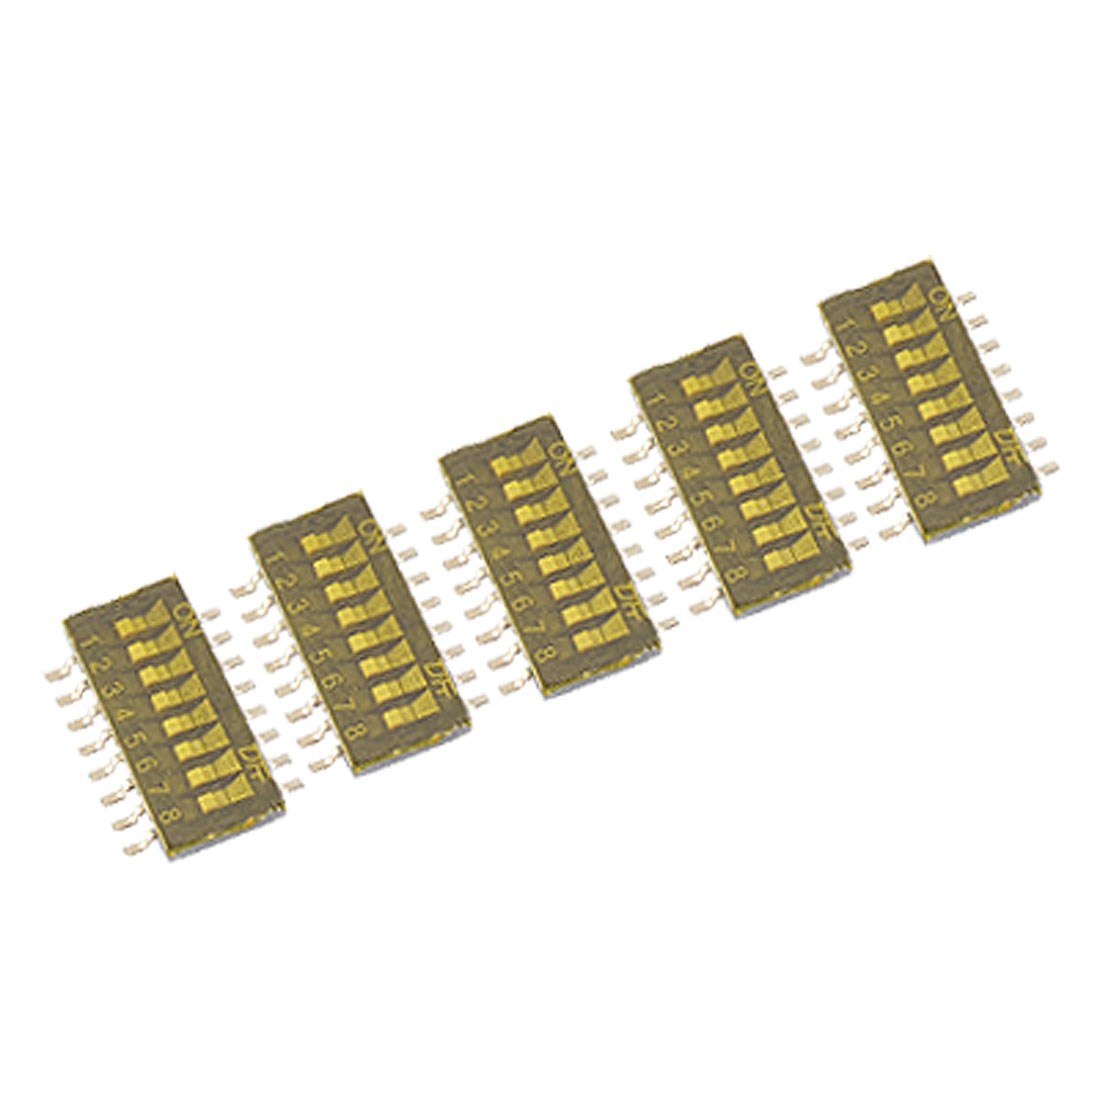 8 Position Dual Row 1.27mm Half Pitch SMT Type DIP Switch 5 Pcs